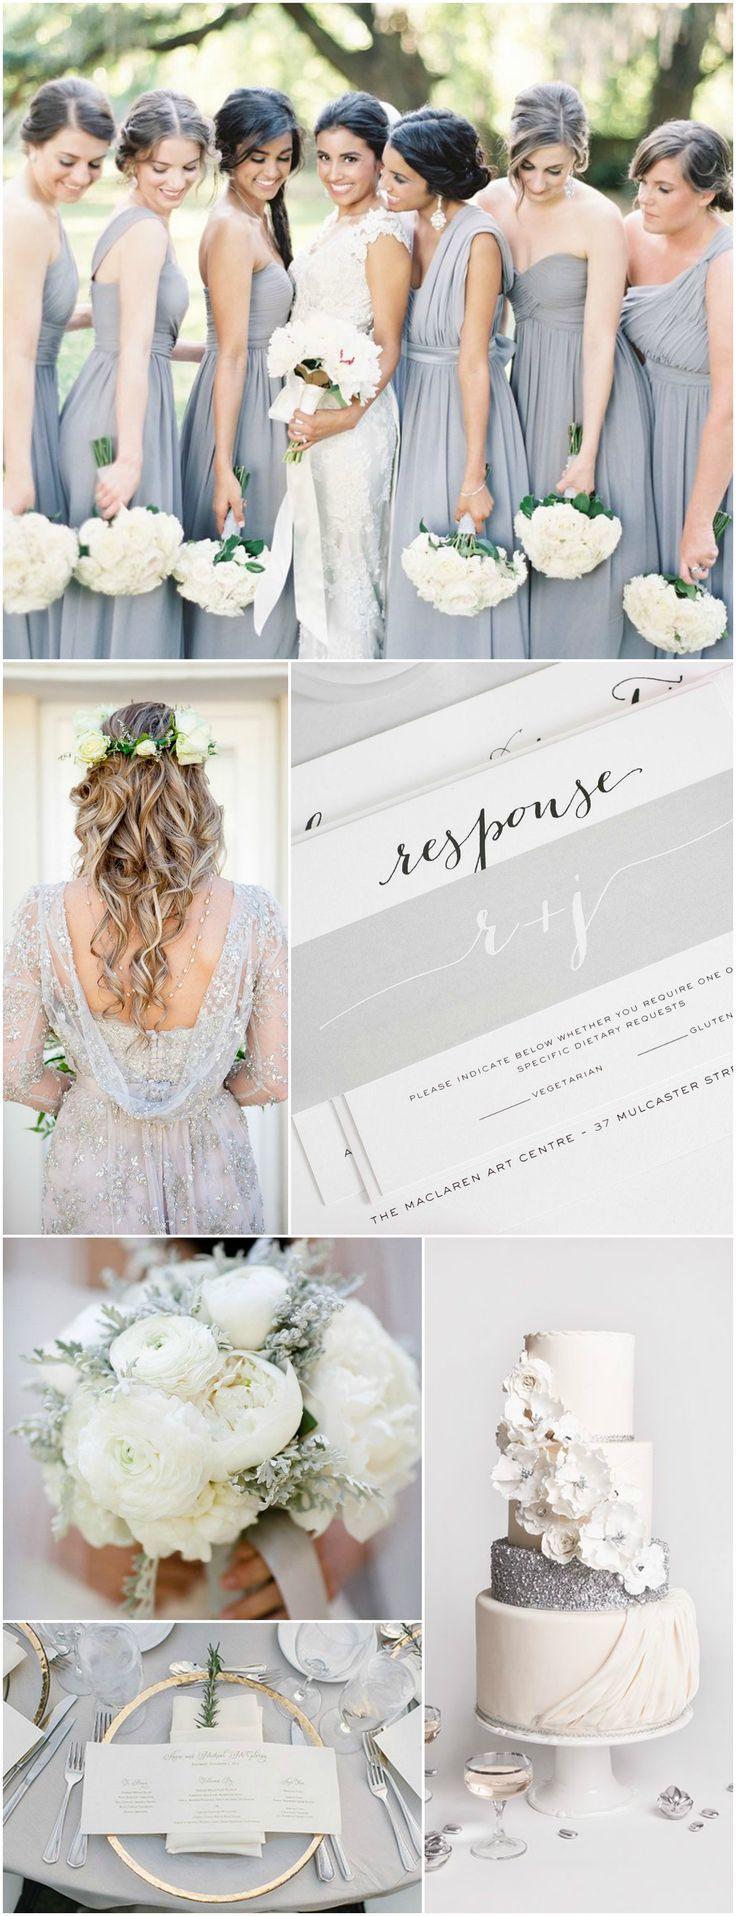 Best 25+ Gray weddings ideas on Pinterest | Grey wedding ...